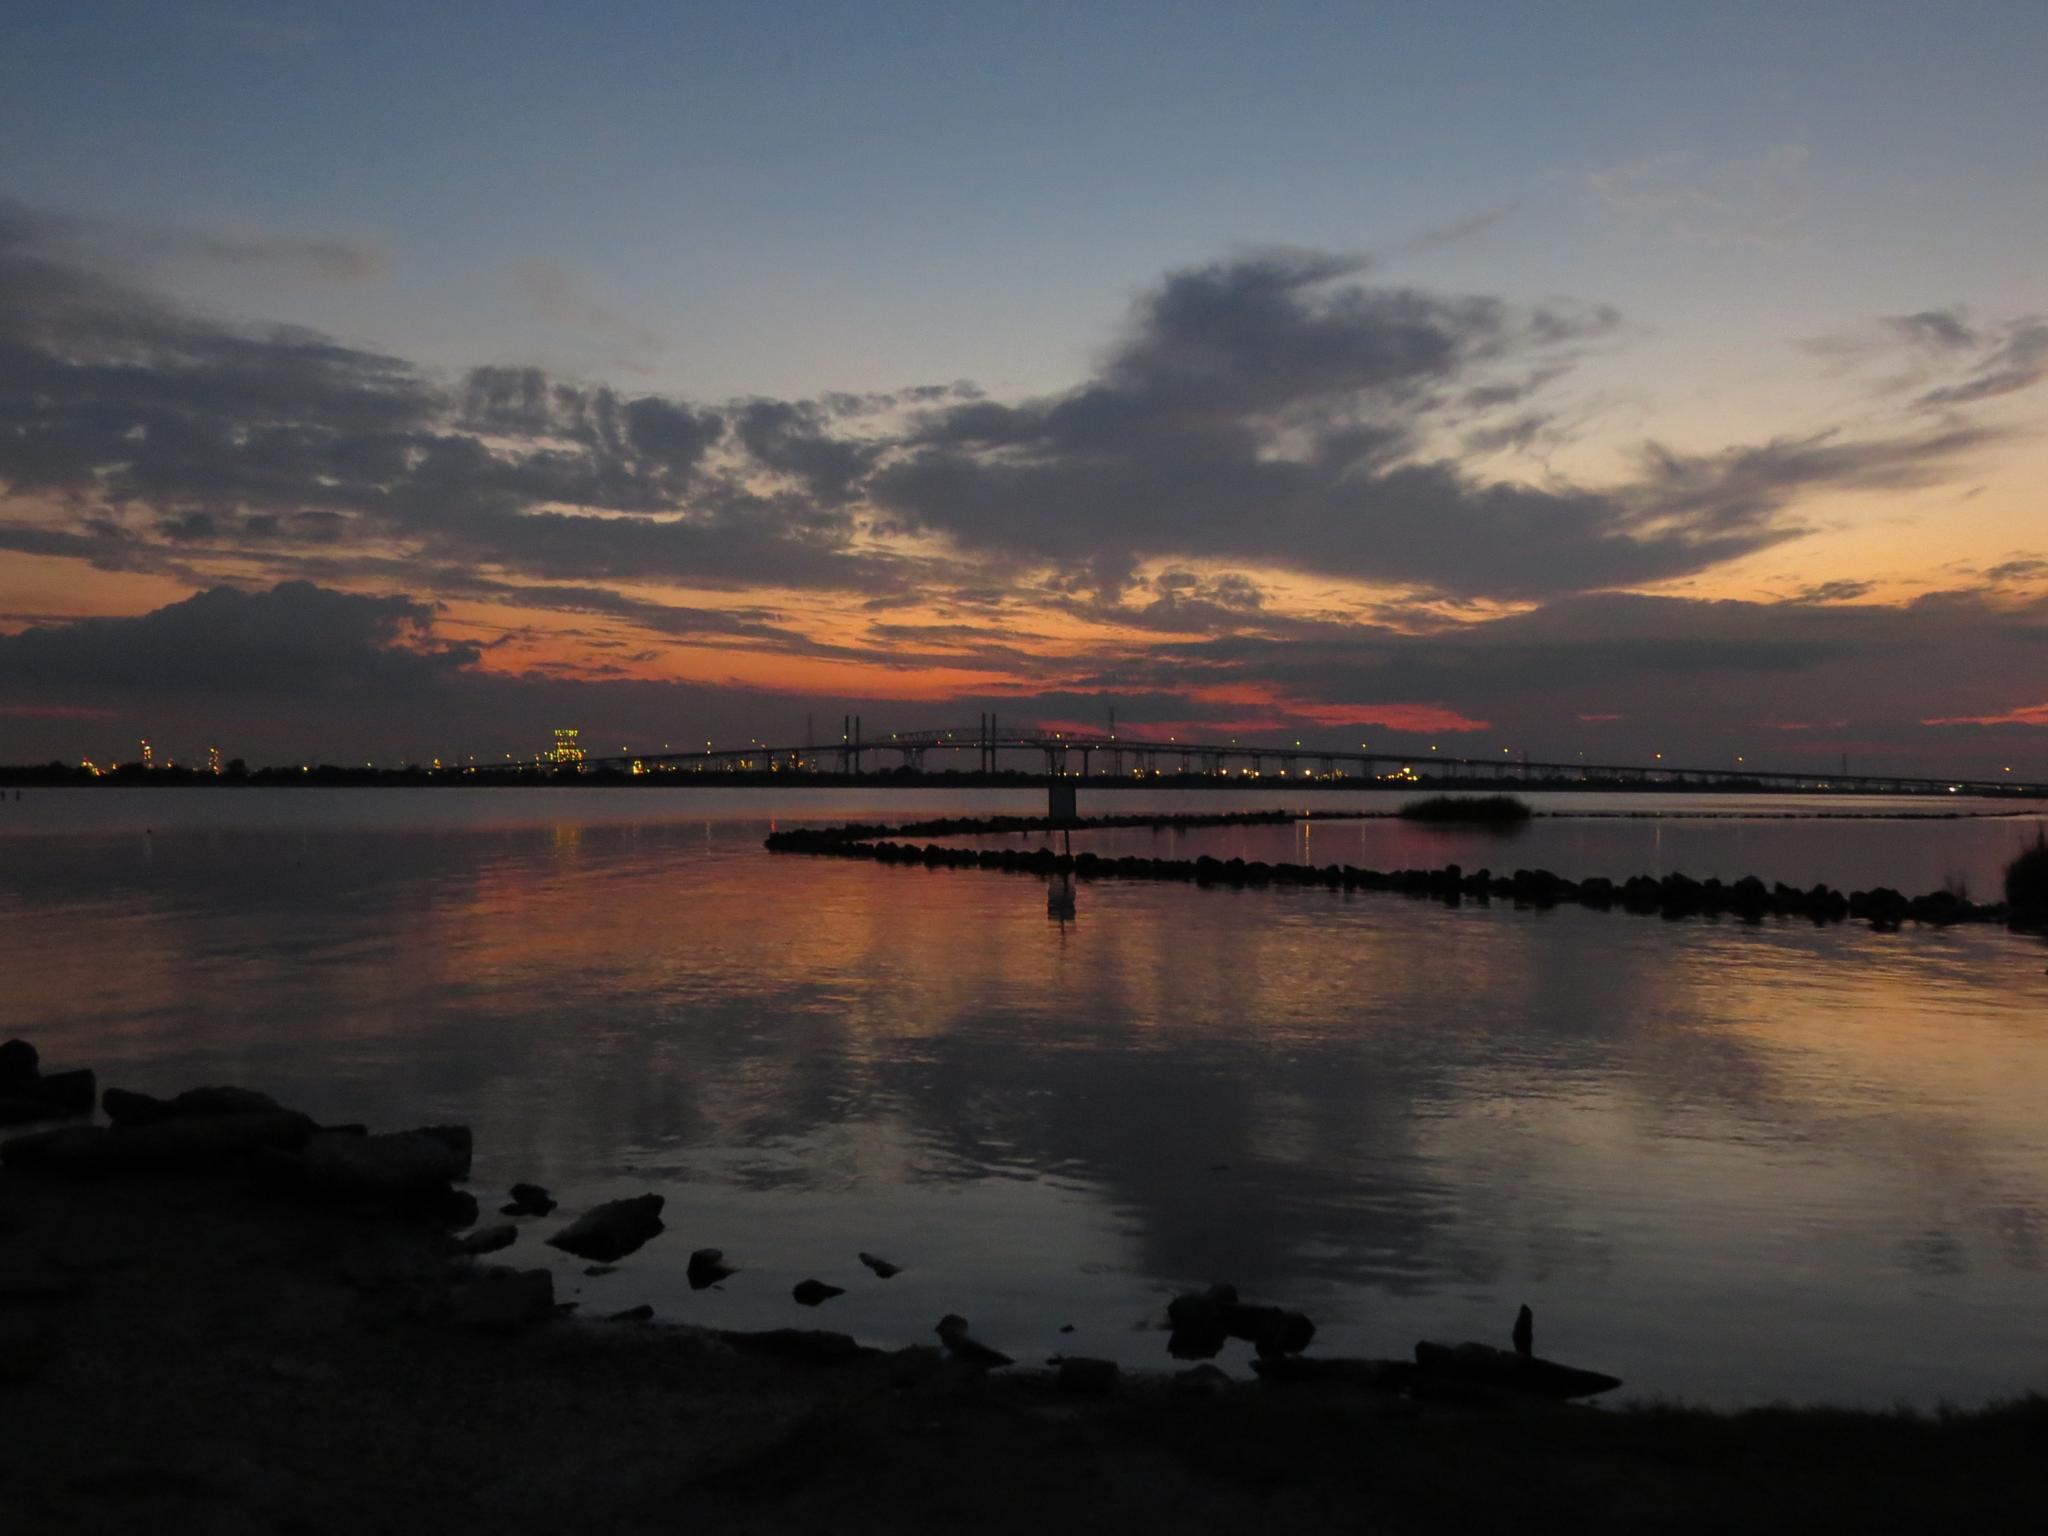 Bridge City Texas Sunset by jerrym